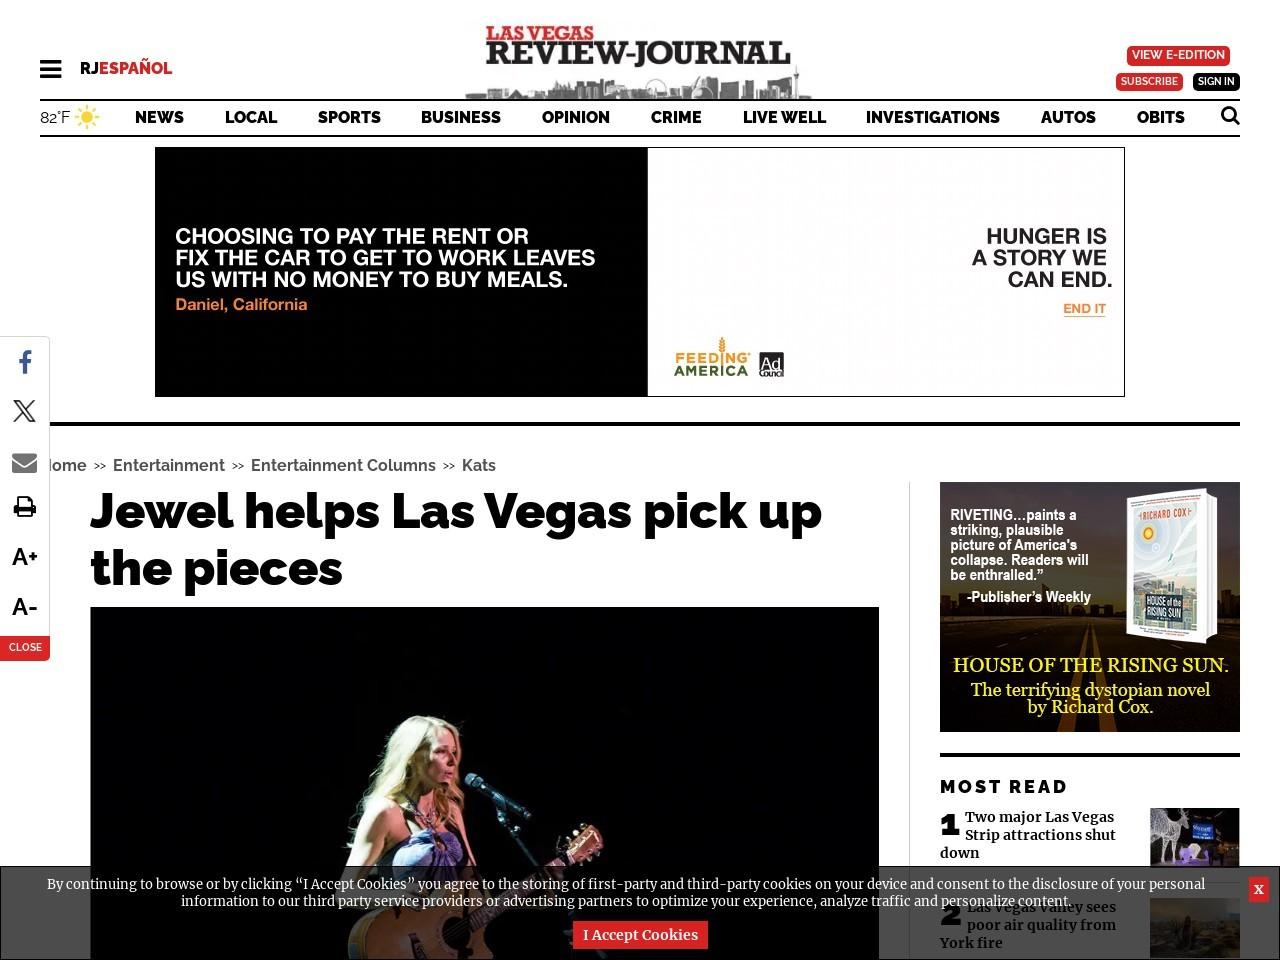 Jewel helps Las Vegas pick up the pieces